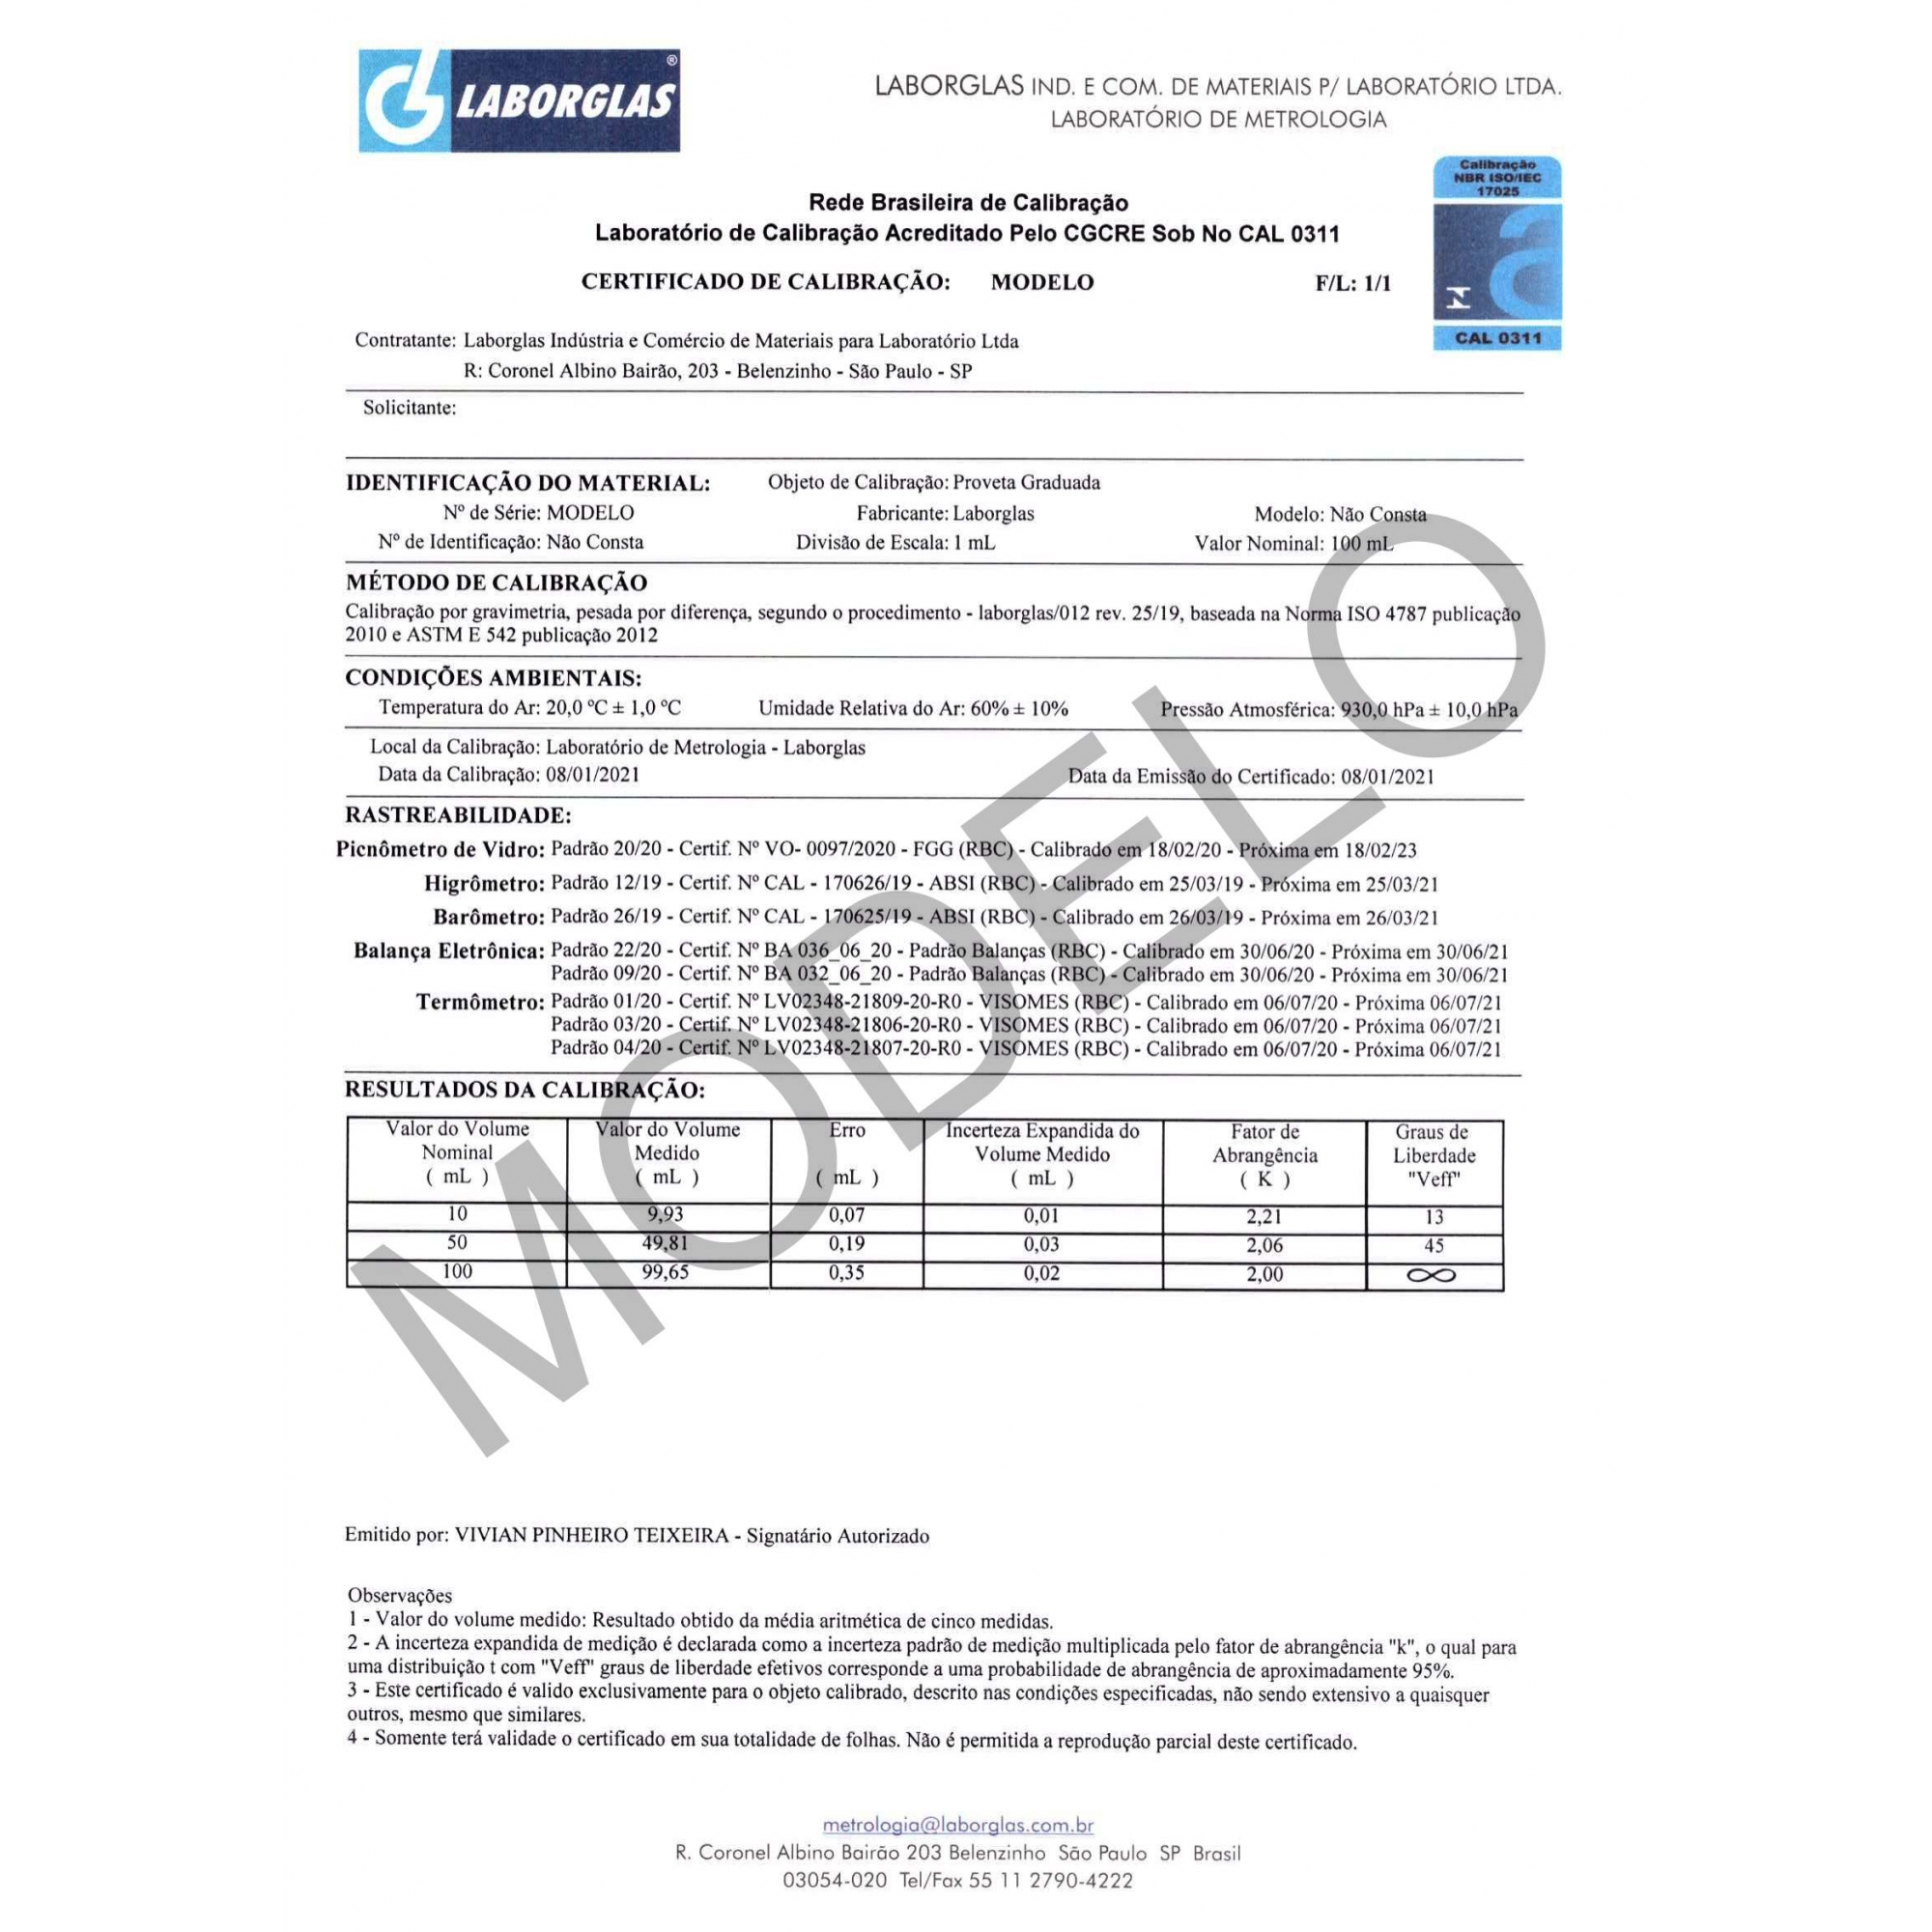 PROVETA GRADUADA BASE HEXAGONAL DE VIDRO 100 ML CLASSE A CERTIFICADO RBC - Laborglas - Cód. 9139724-R